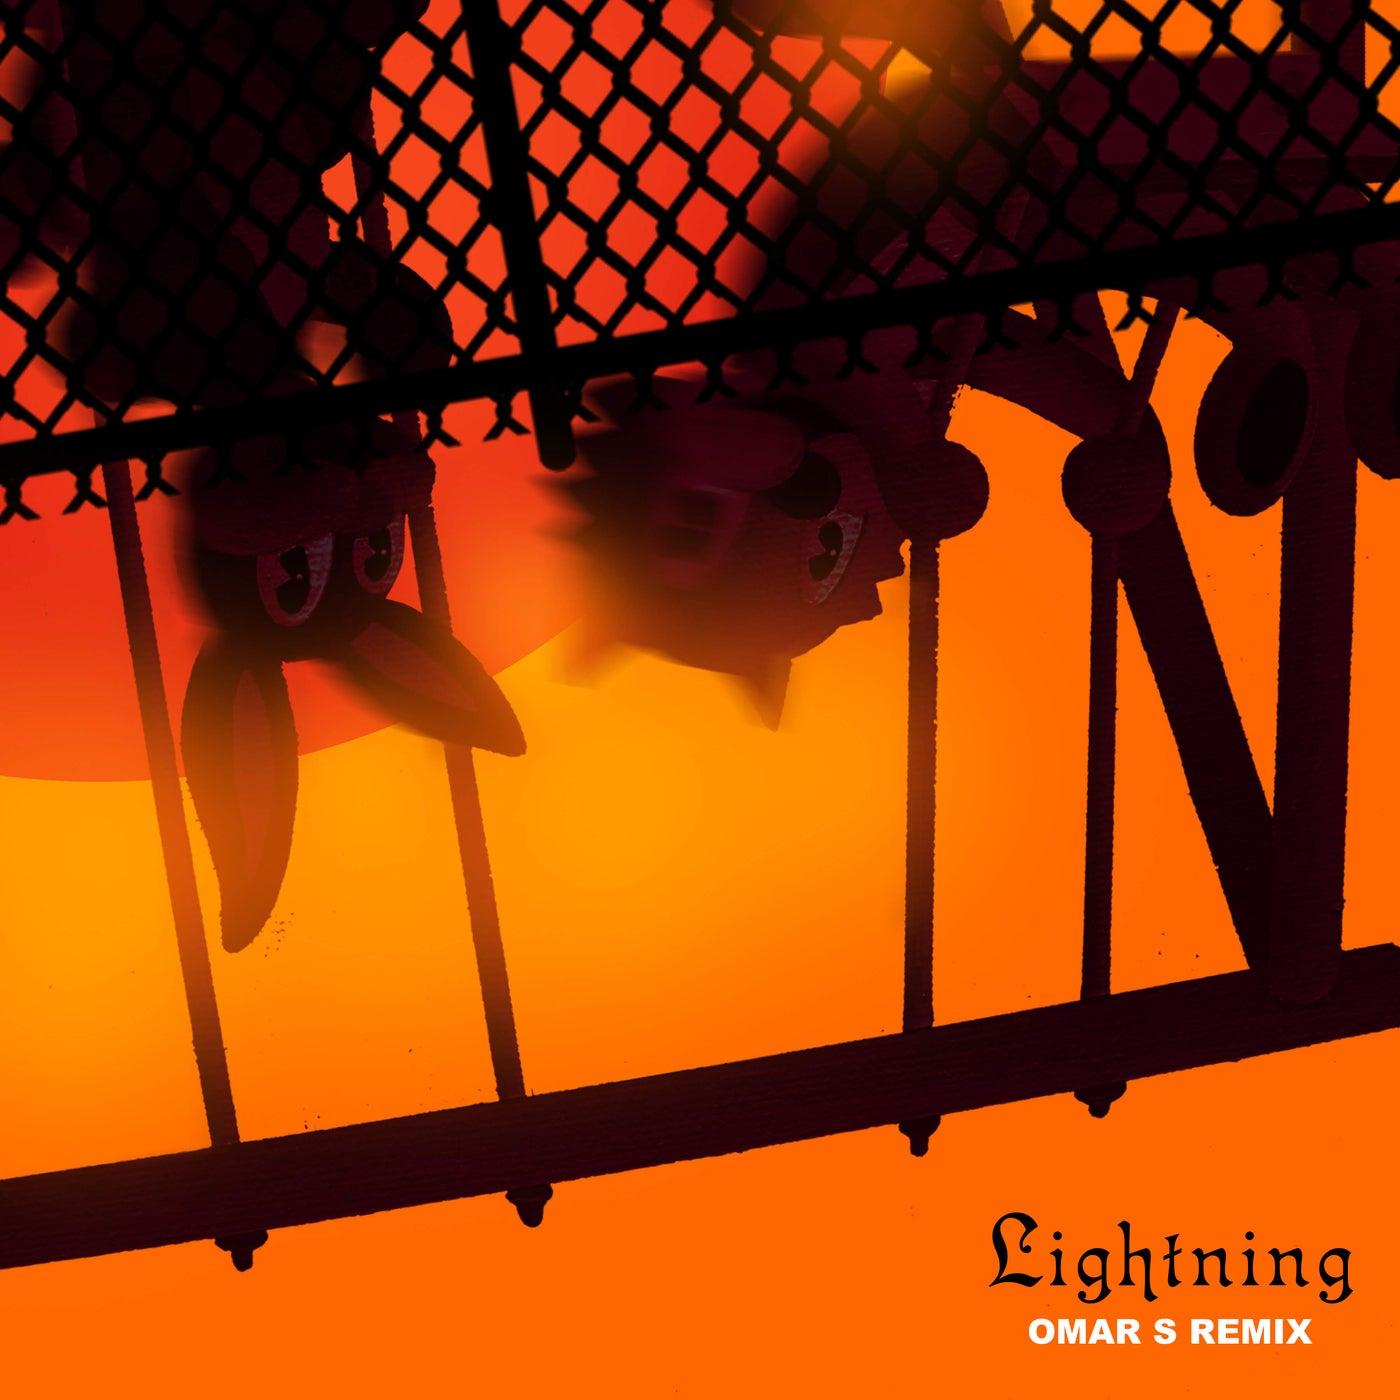 Lightning (feat. Evelyn Glennie) (Omar S Remix)